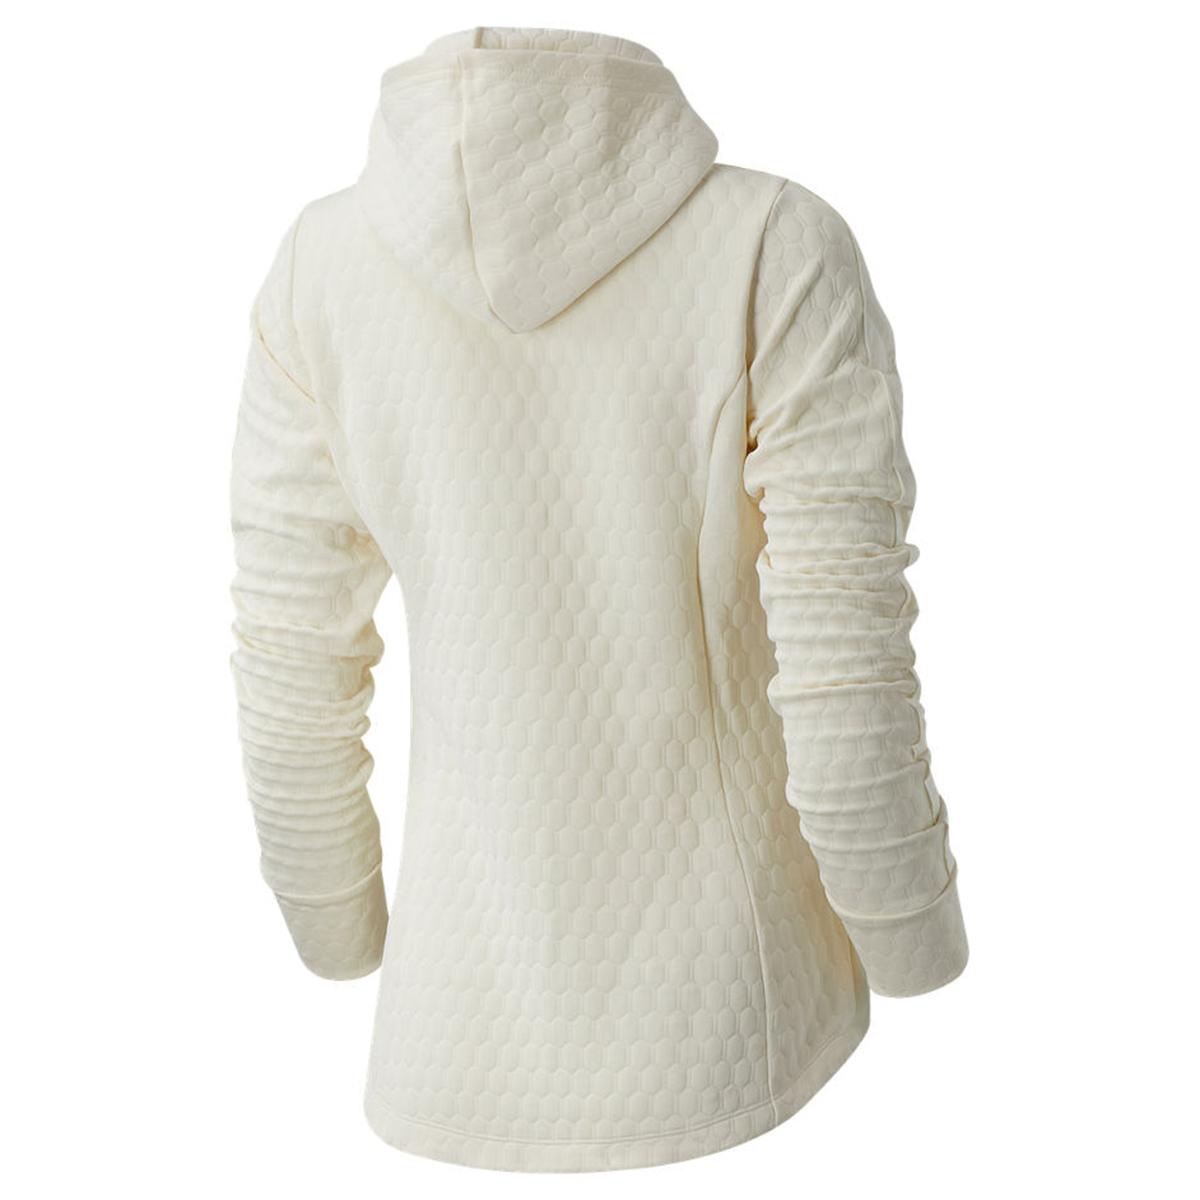 Women's New Balance HeatLoft Jacket - Color: Sea Salt Heather - Size: L, Sea Salt Heather, large, image 2